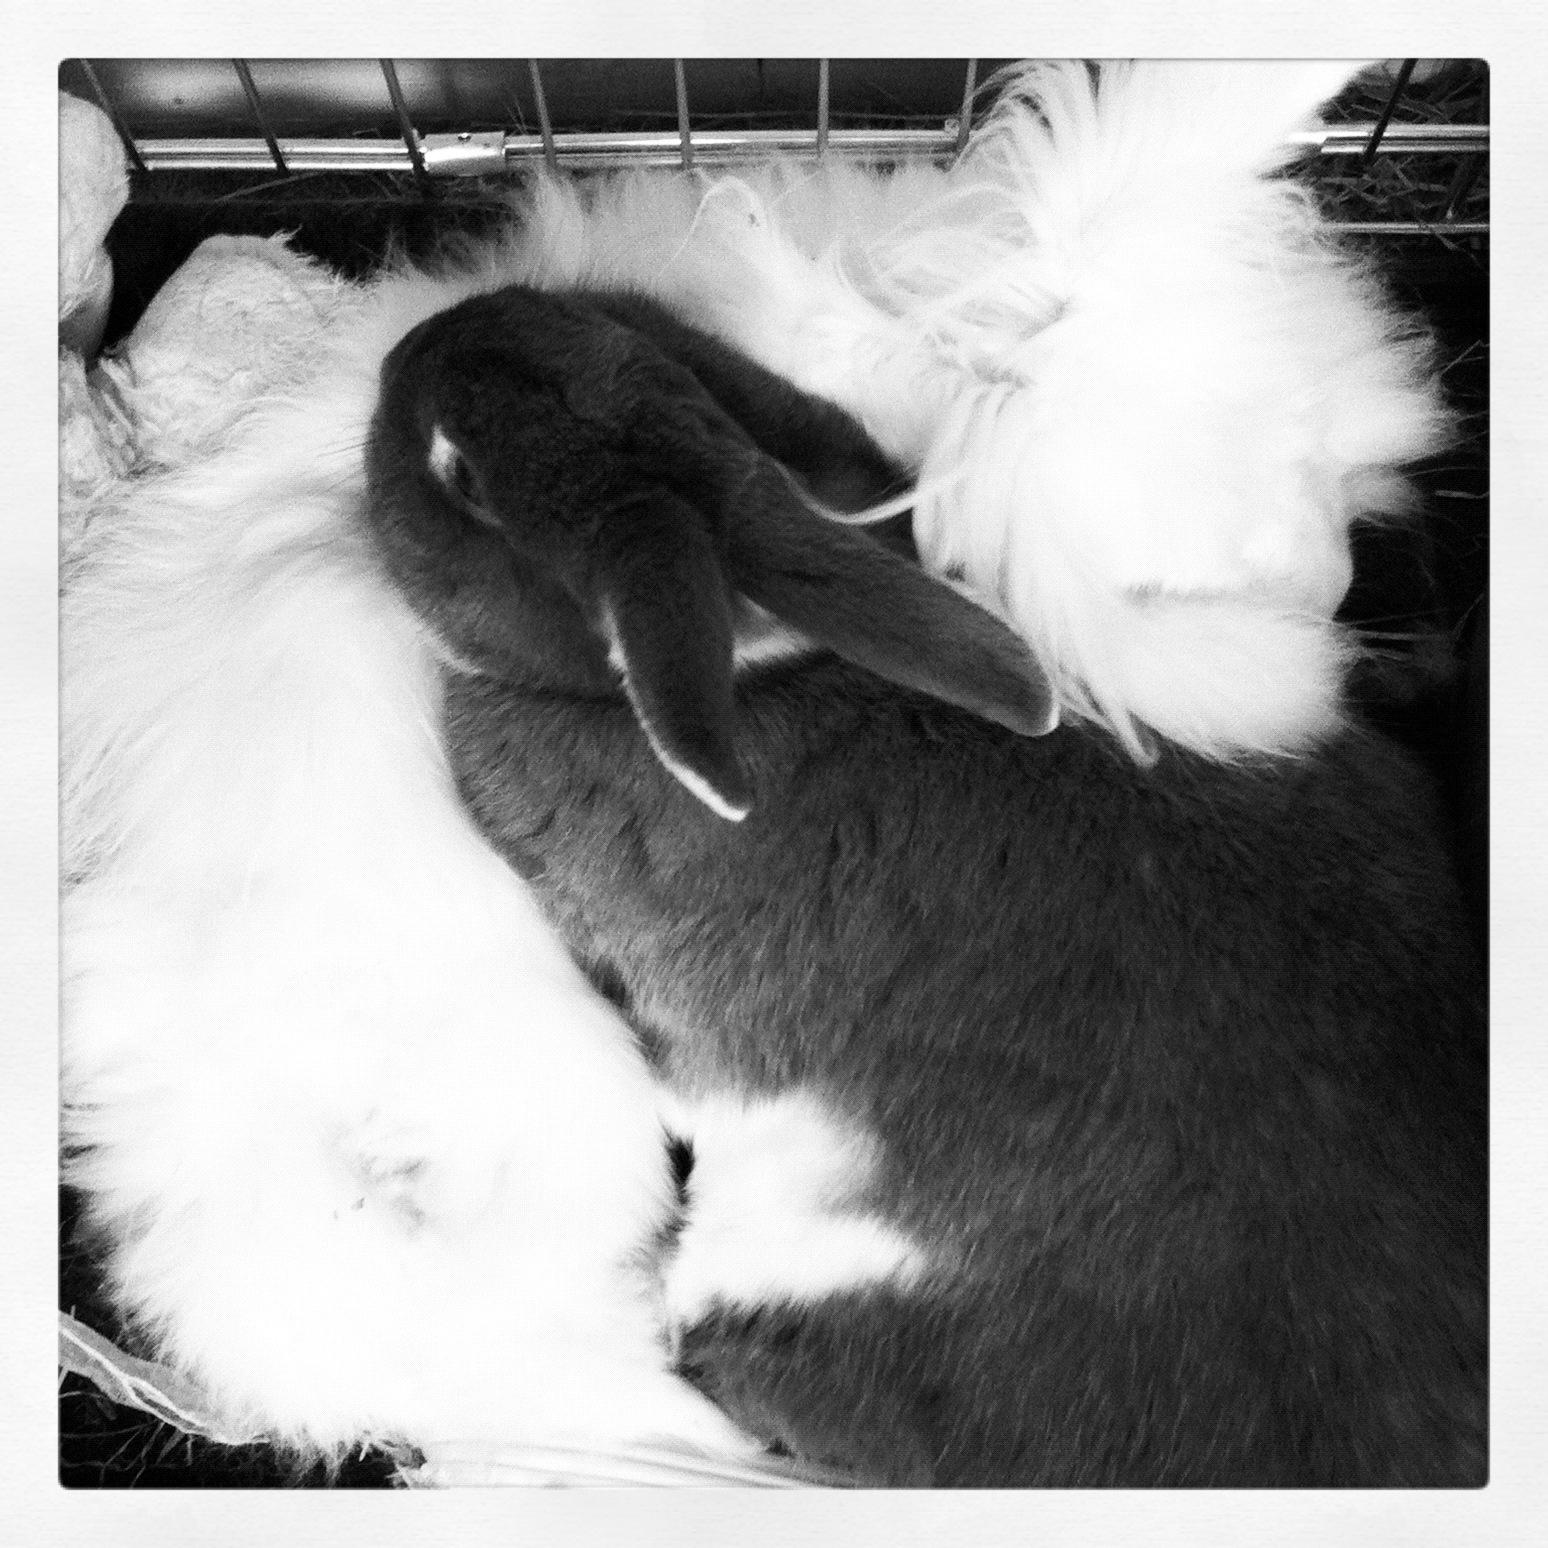 Bunnies Cuddle Together